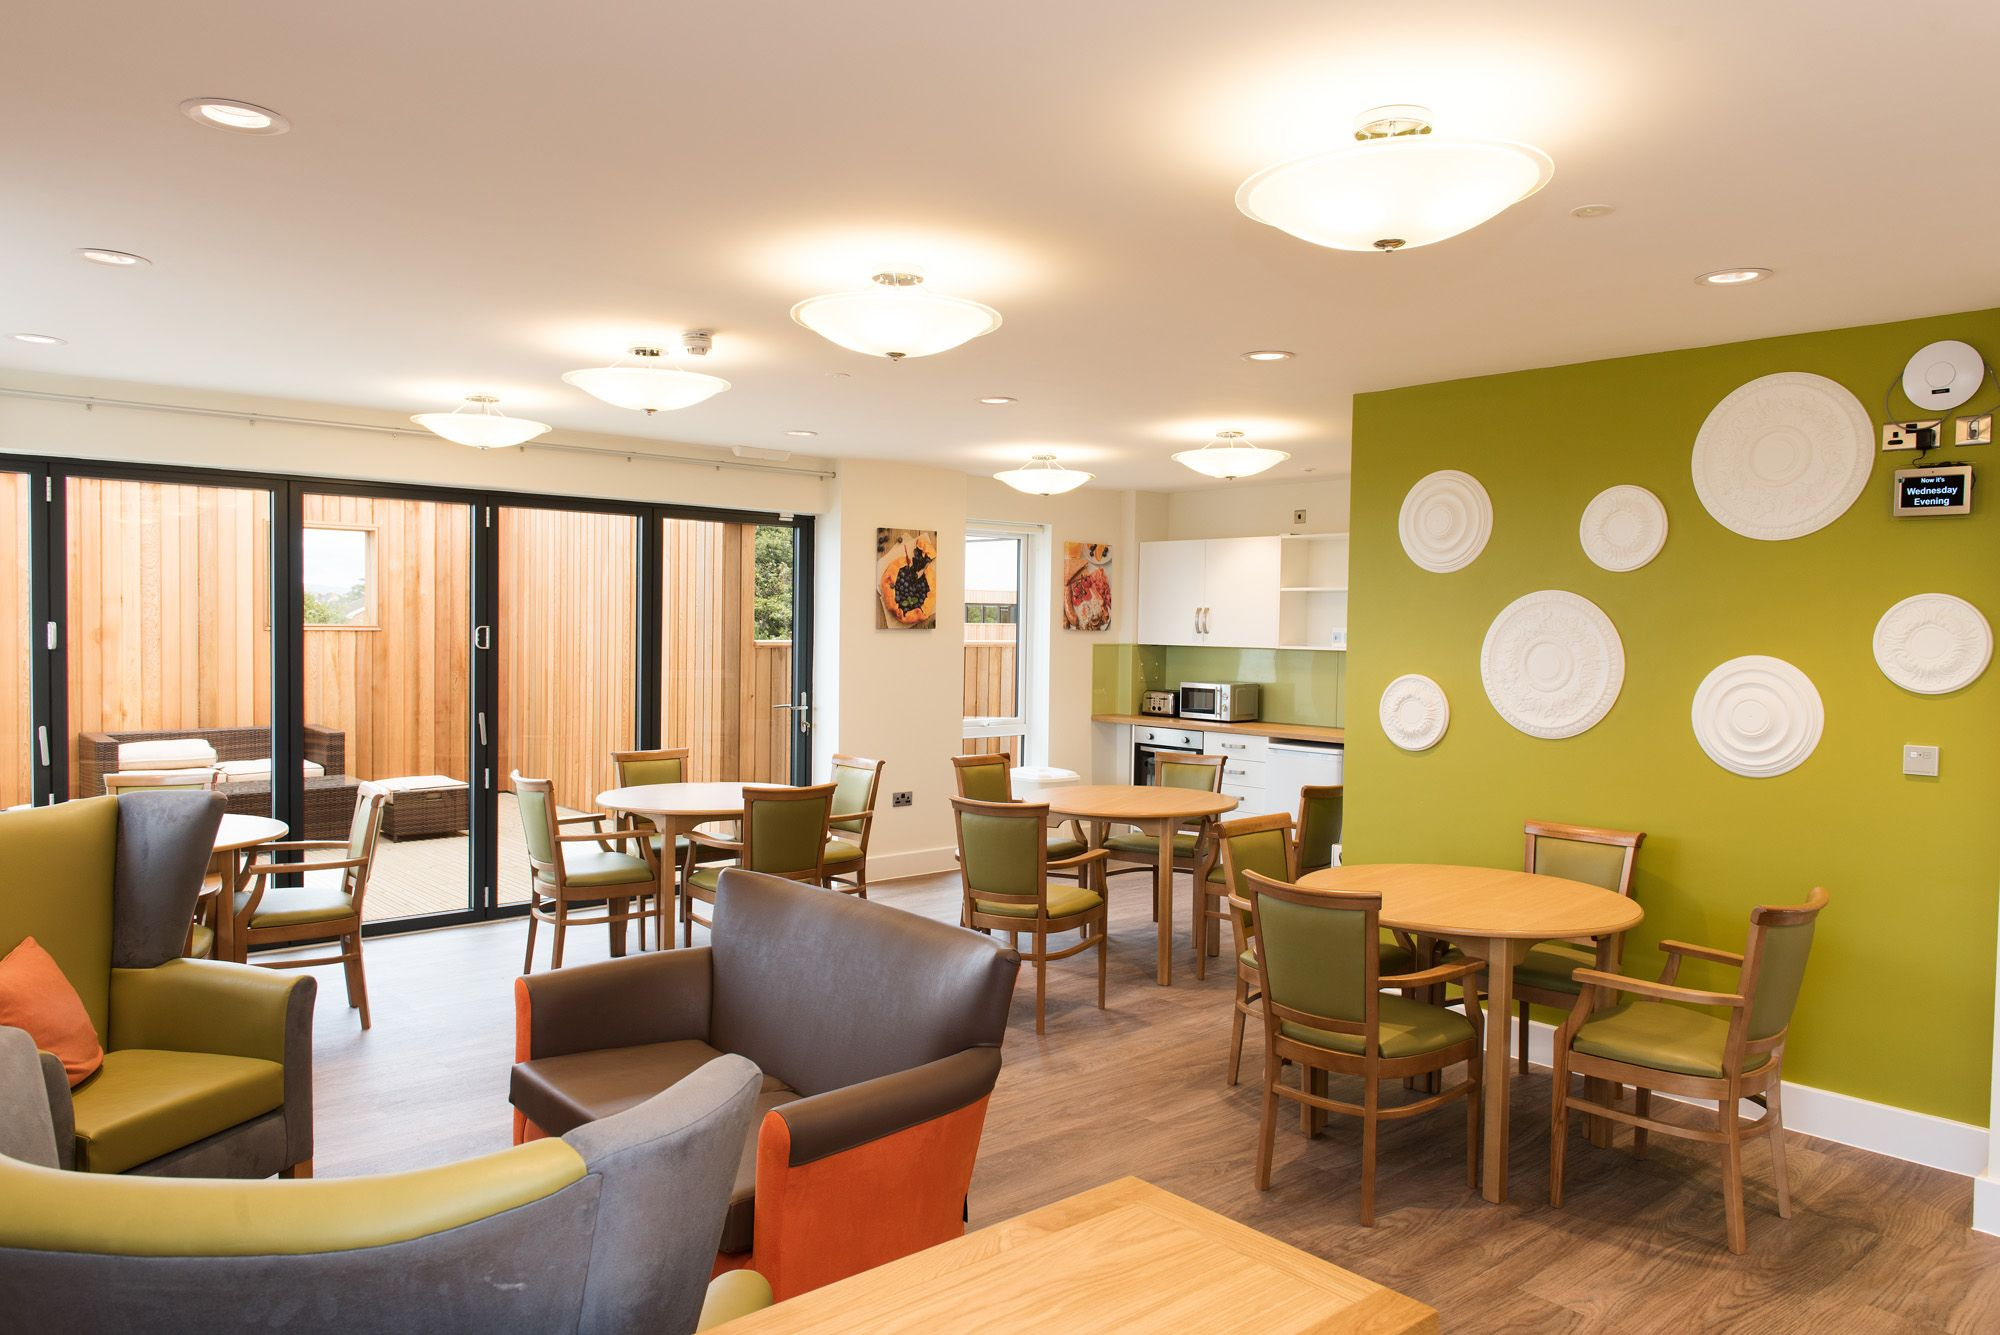 Crave Id Fairways Scandinavian Inspired Dementia Care Centre Home Interior Dementia Care